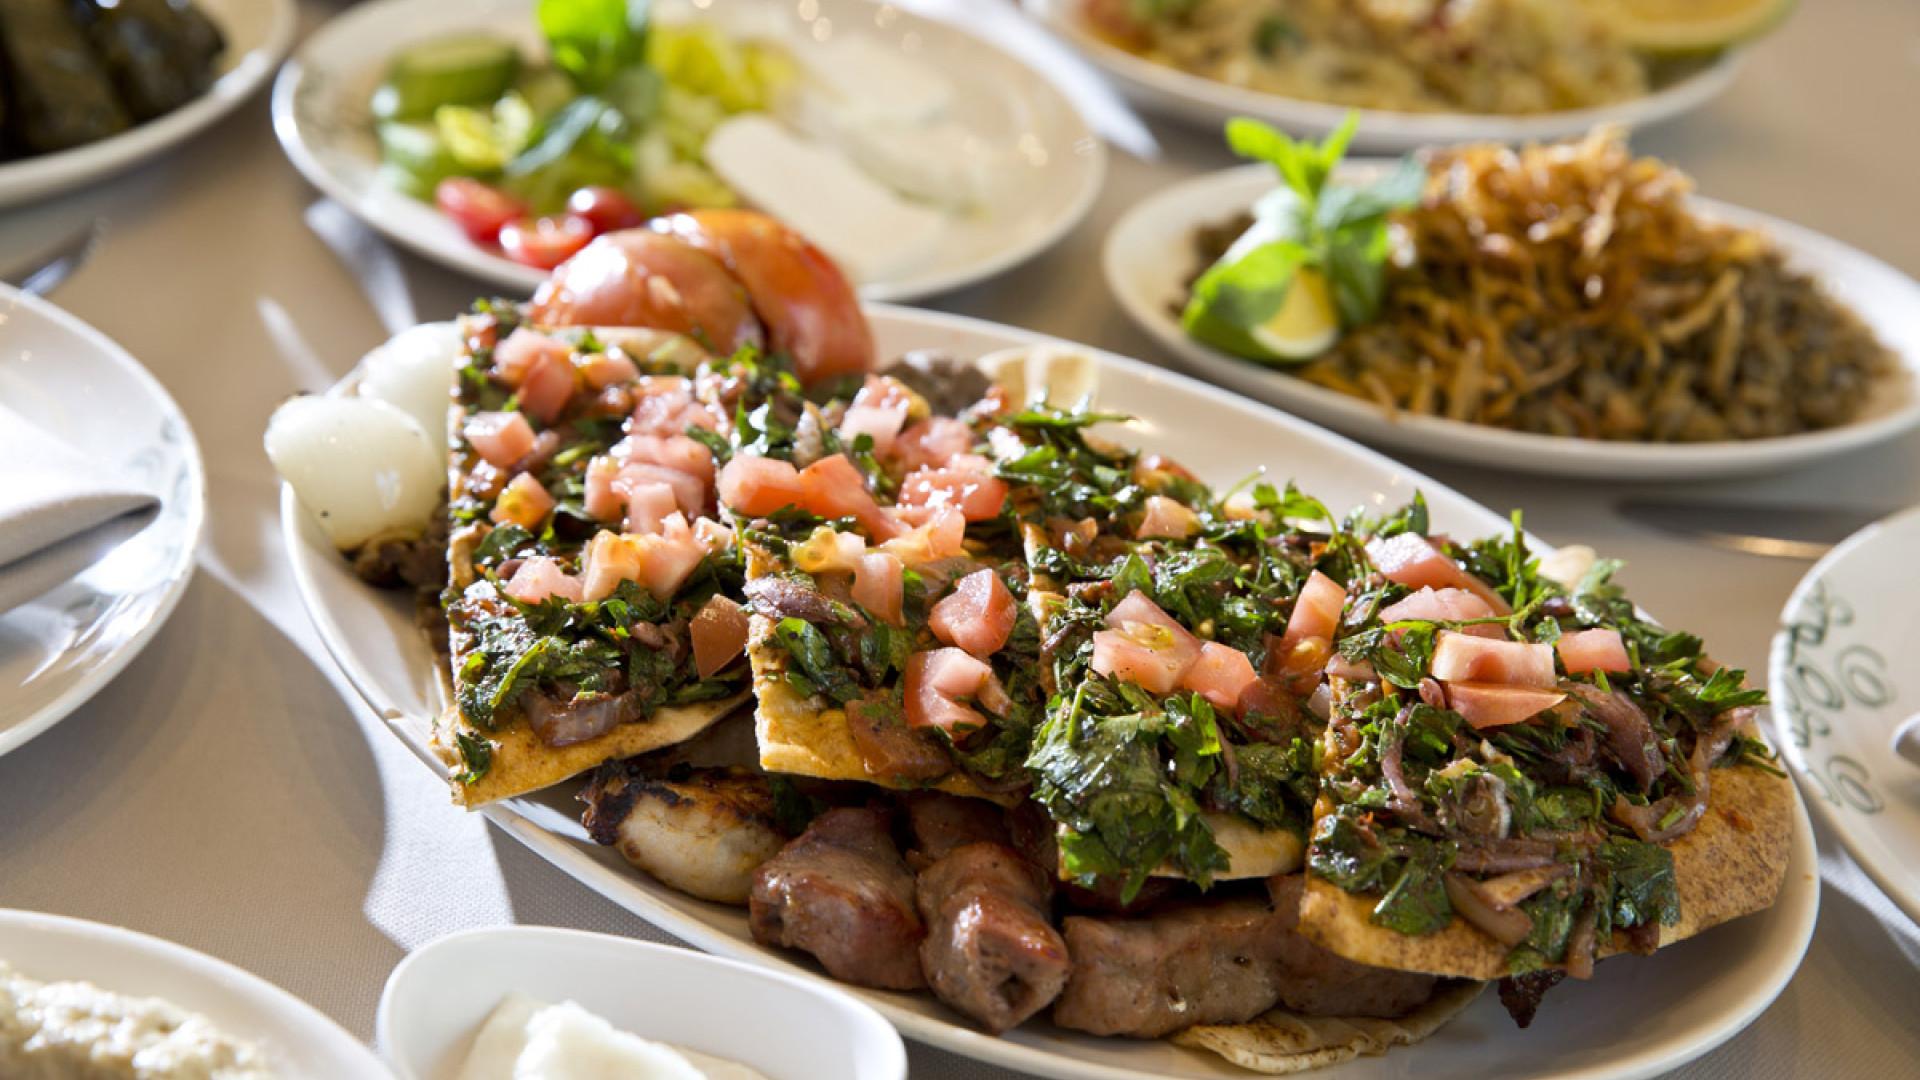 Lebanese feasting at Abd el Wahab